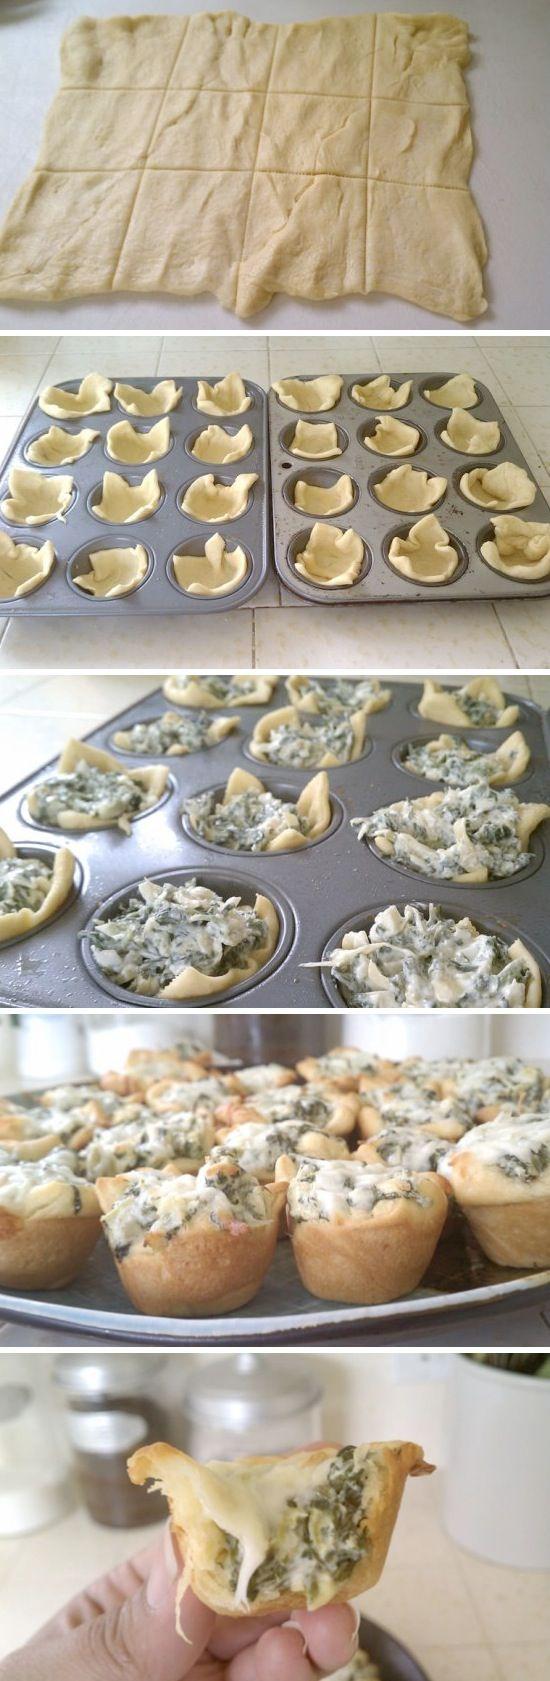 Spinach Artichoke Bites easy appetizer or meal Carol